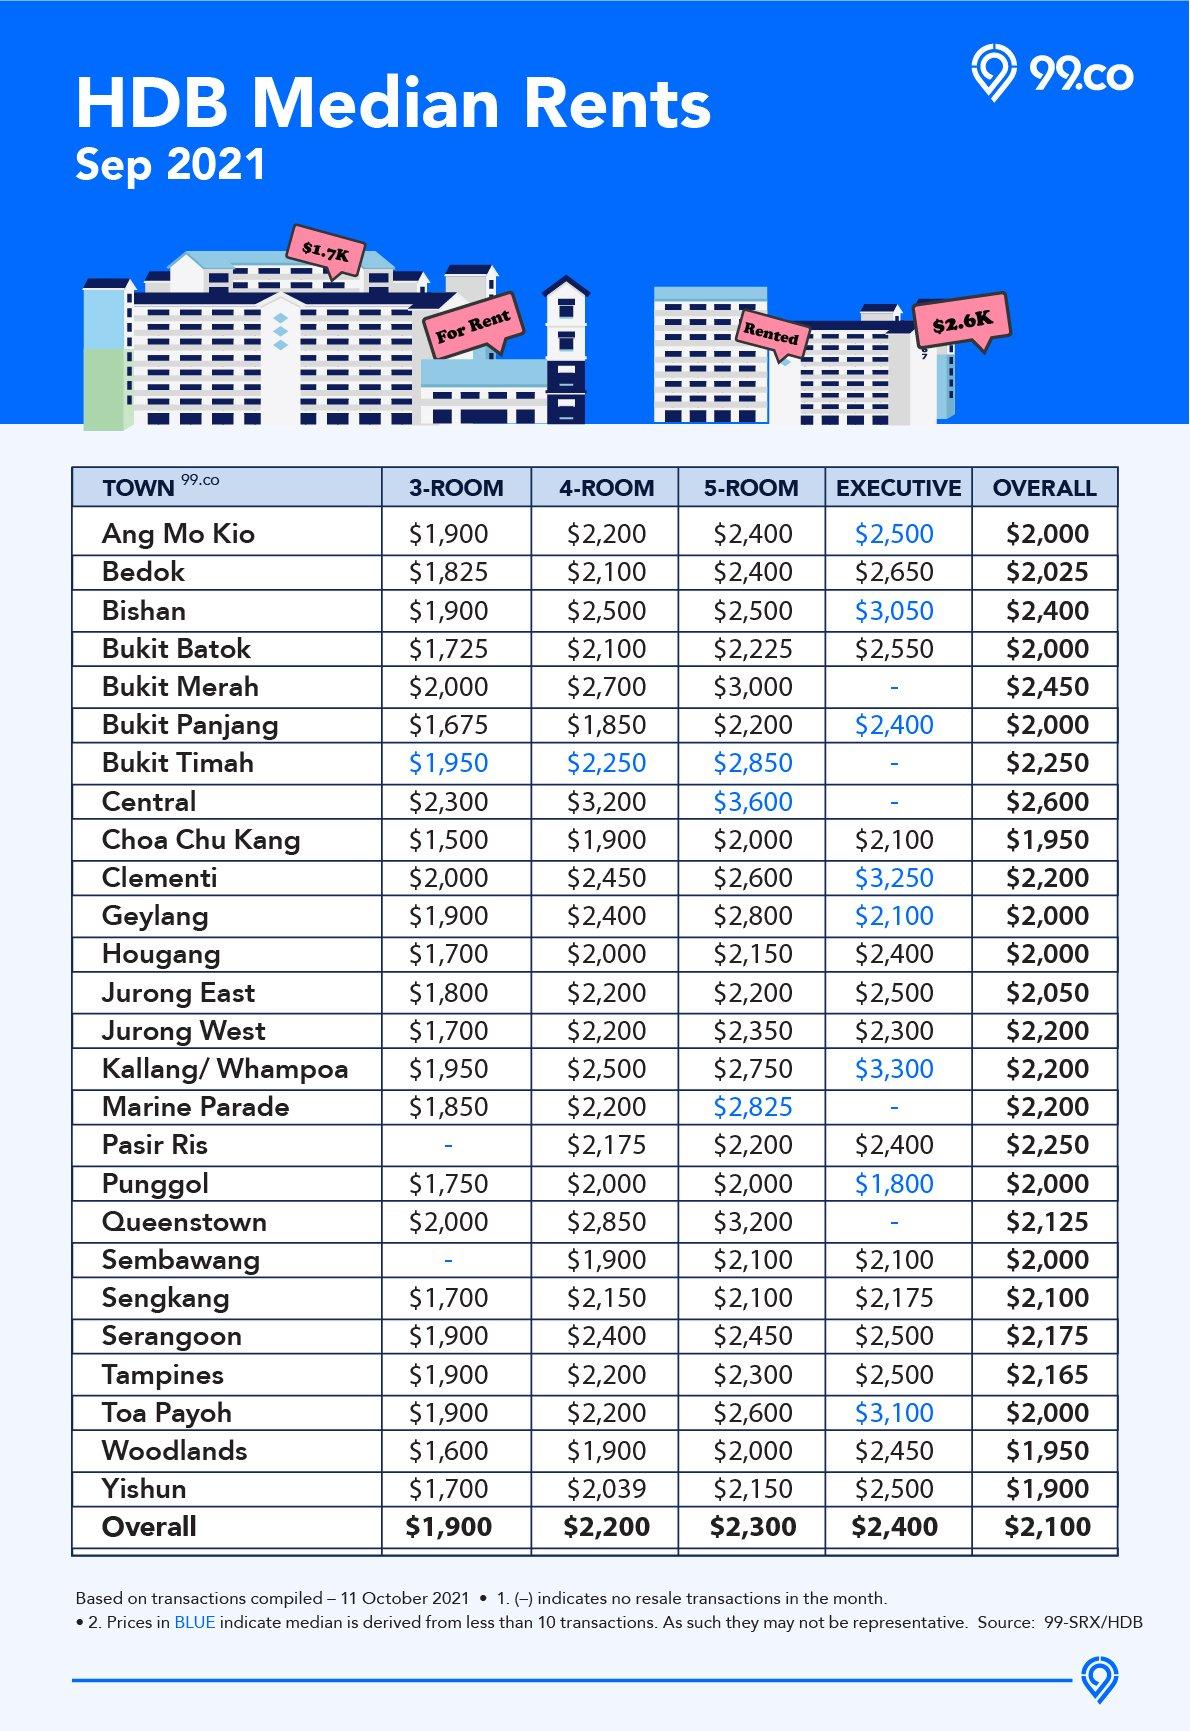 HDB median rent infographic